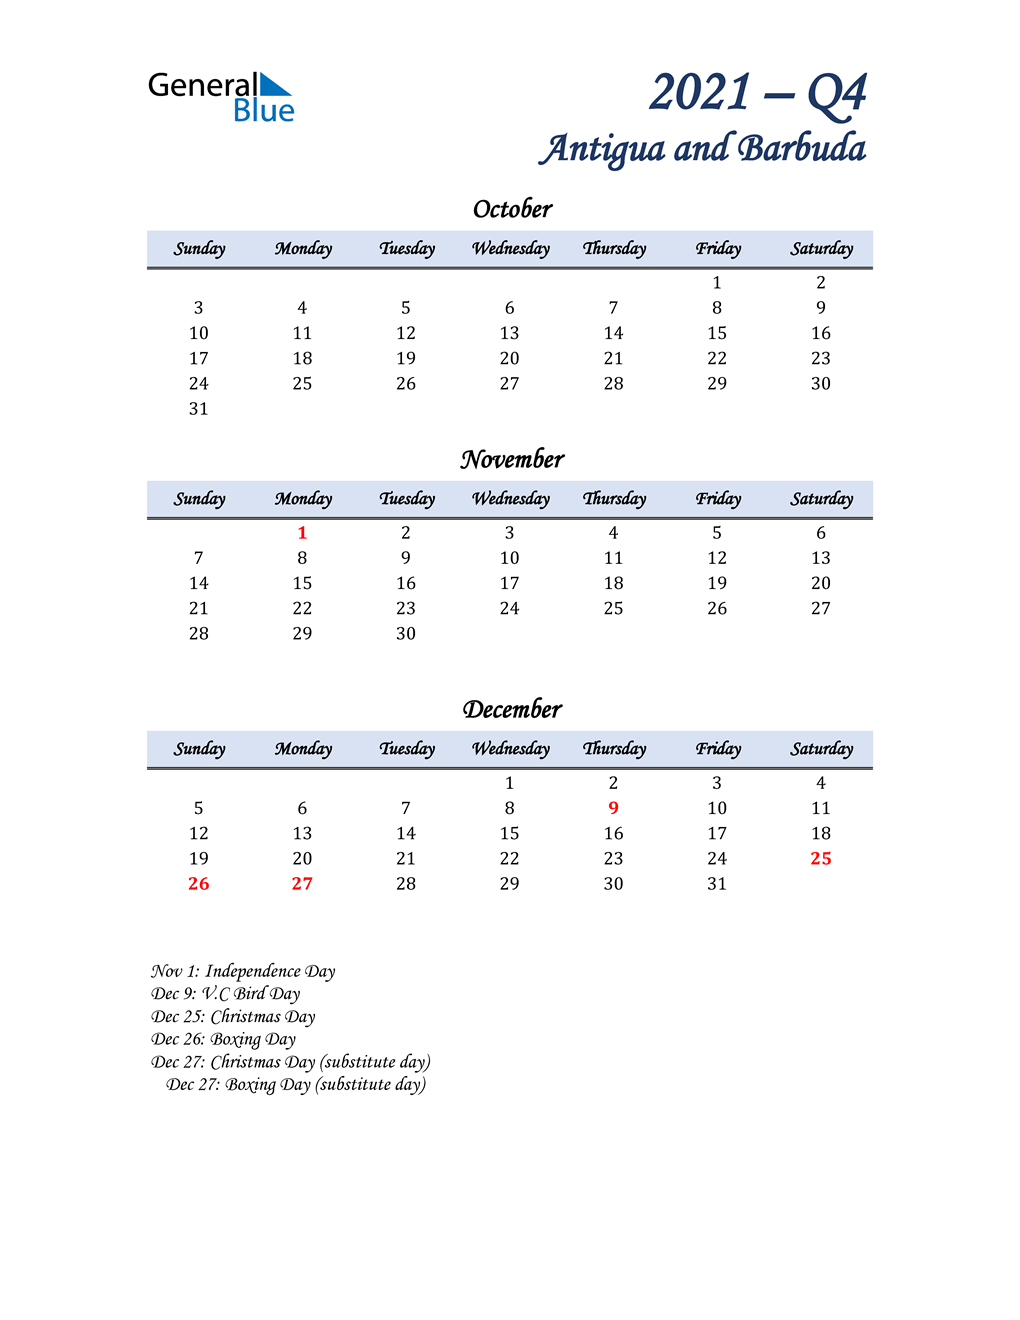 October, November, and December Calendar for Antigua and Barbuda